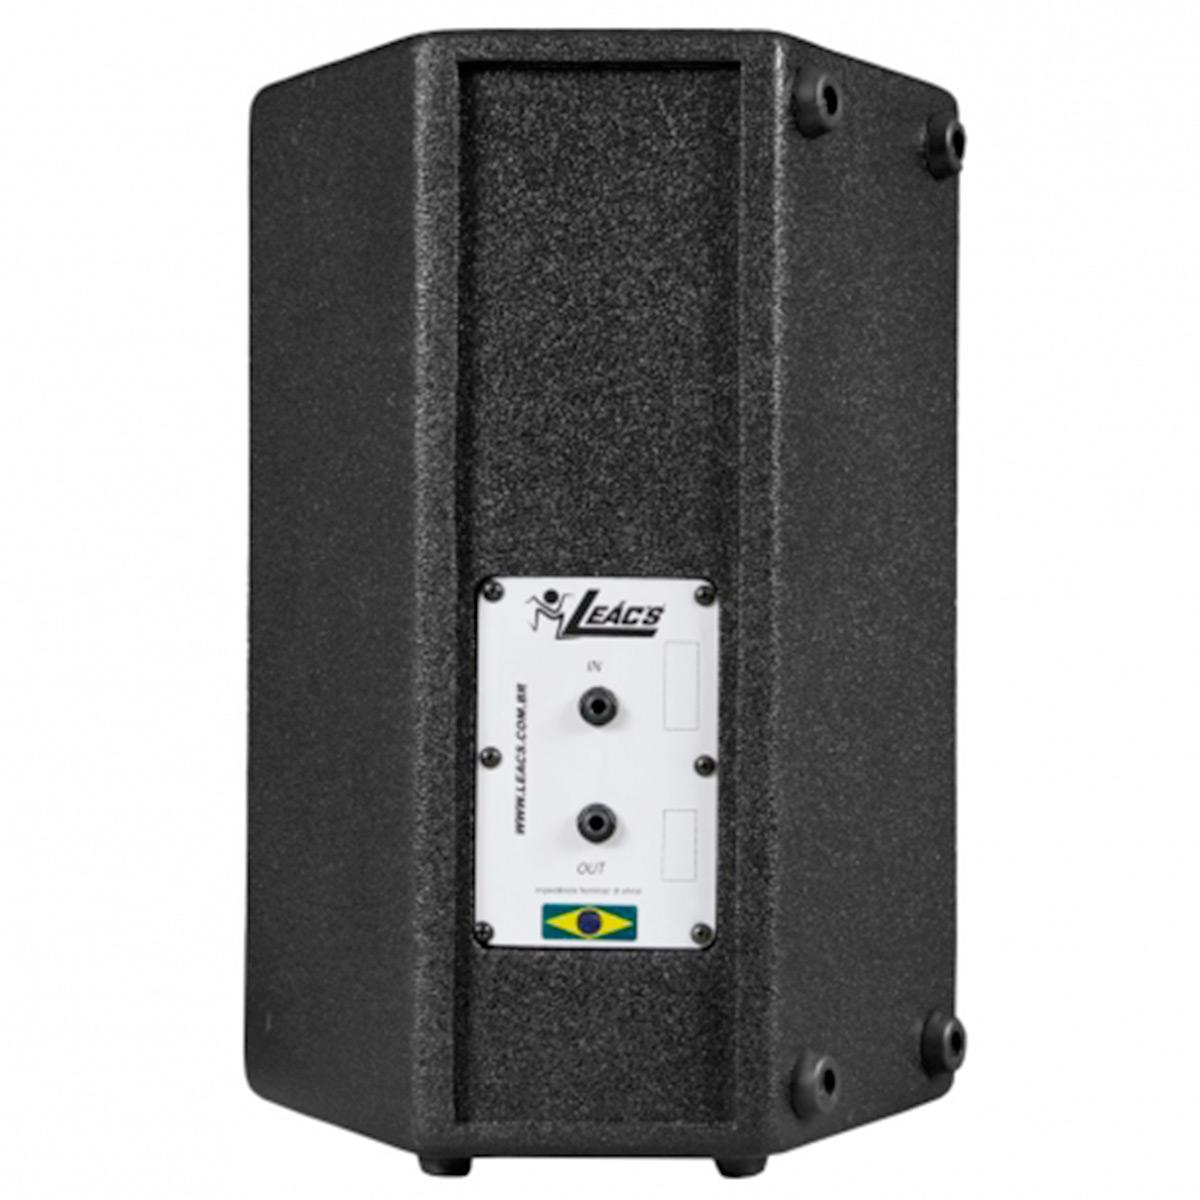 Caixa Passiva Fal 10 Pol 80W PA / Monitor - FIT 160 Leacs